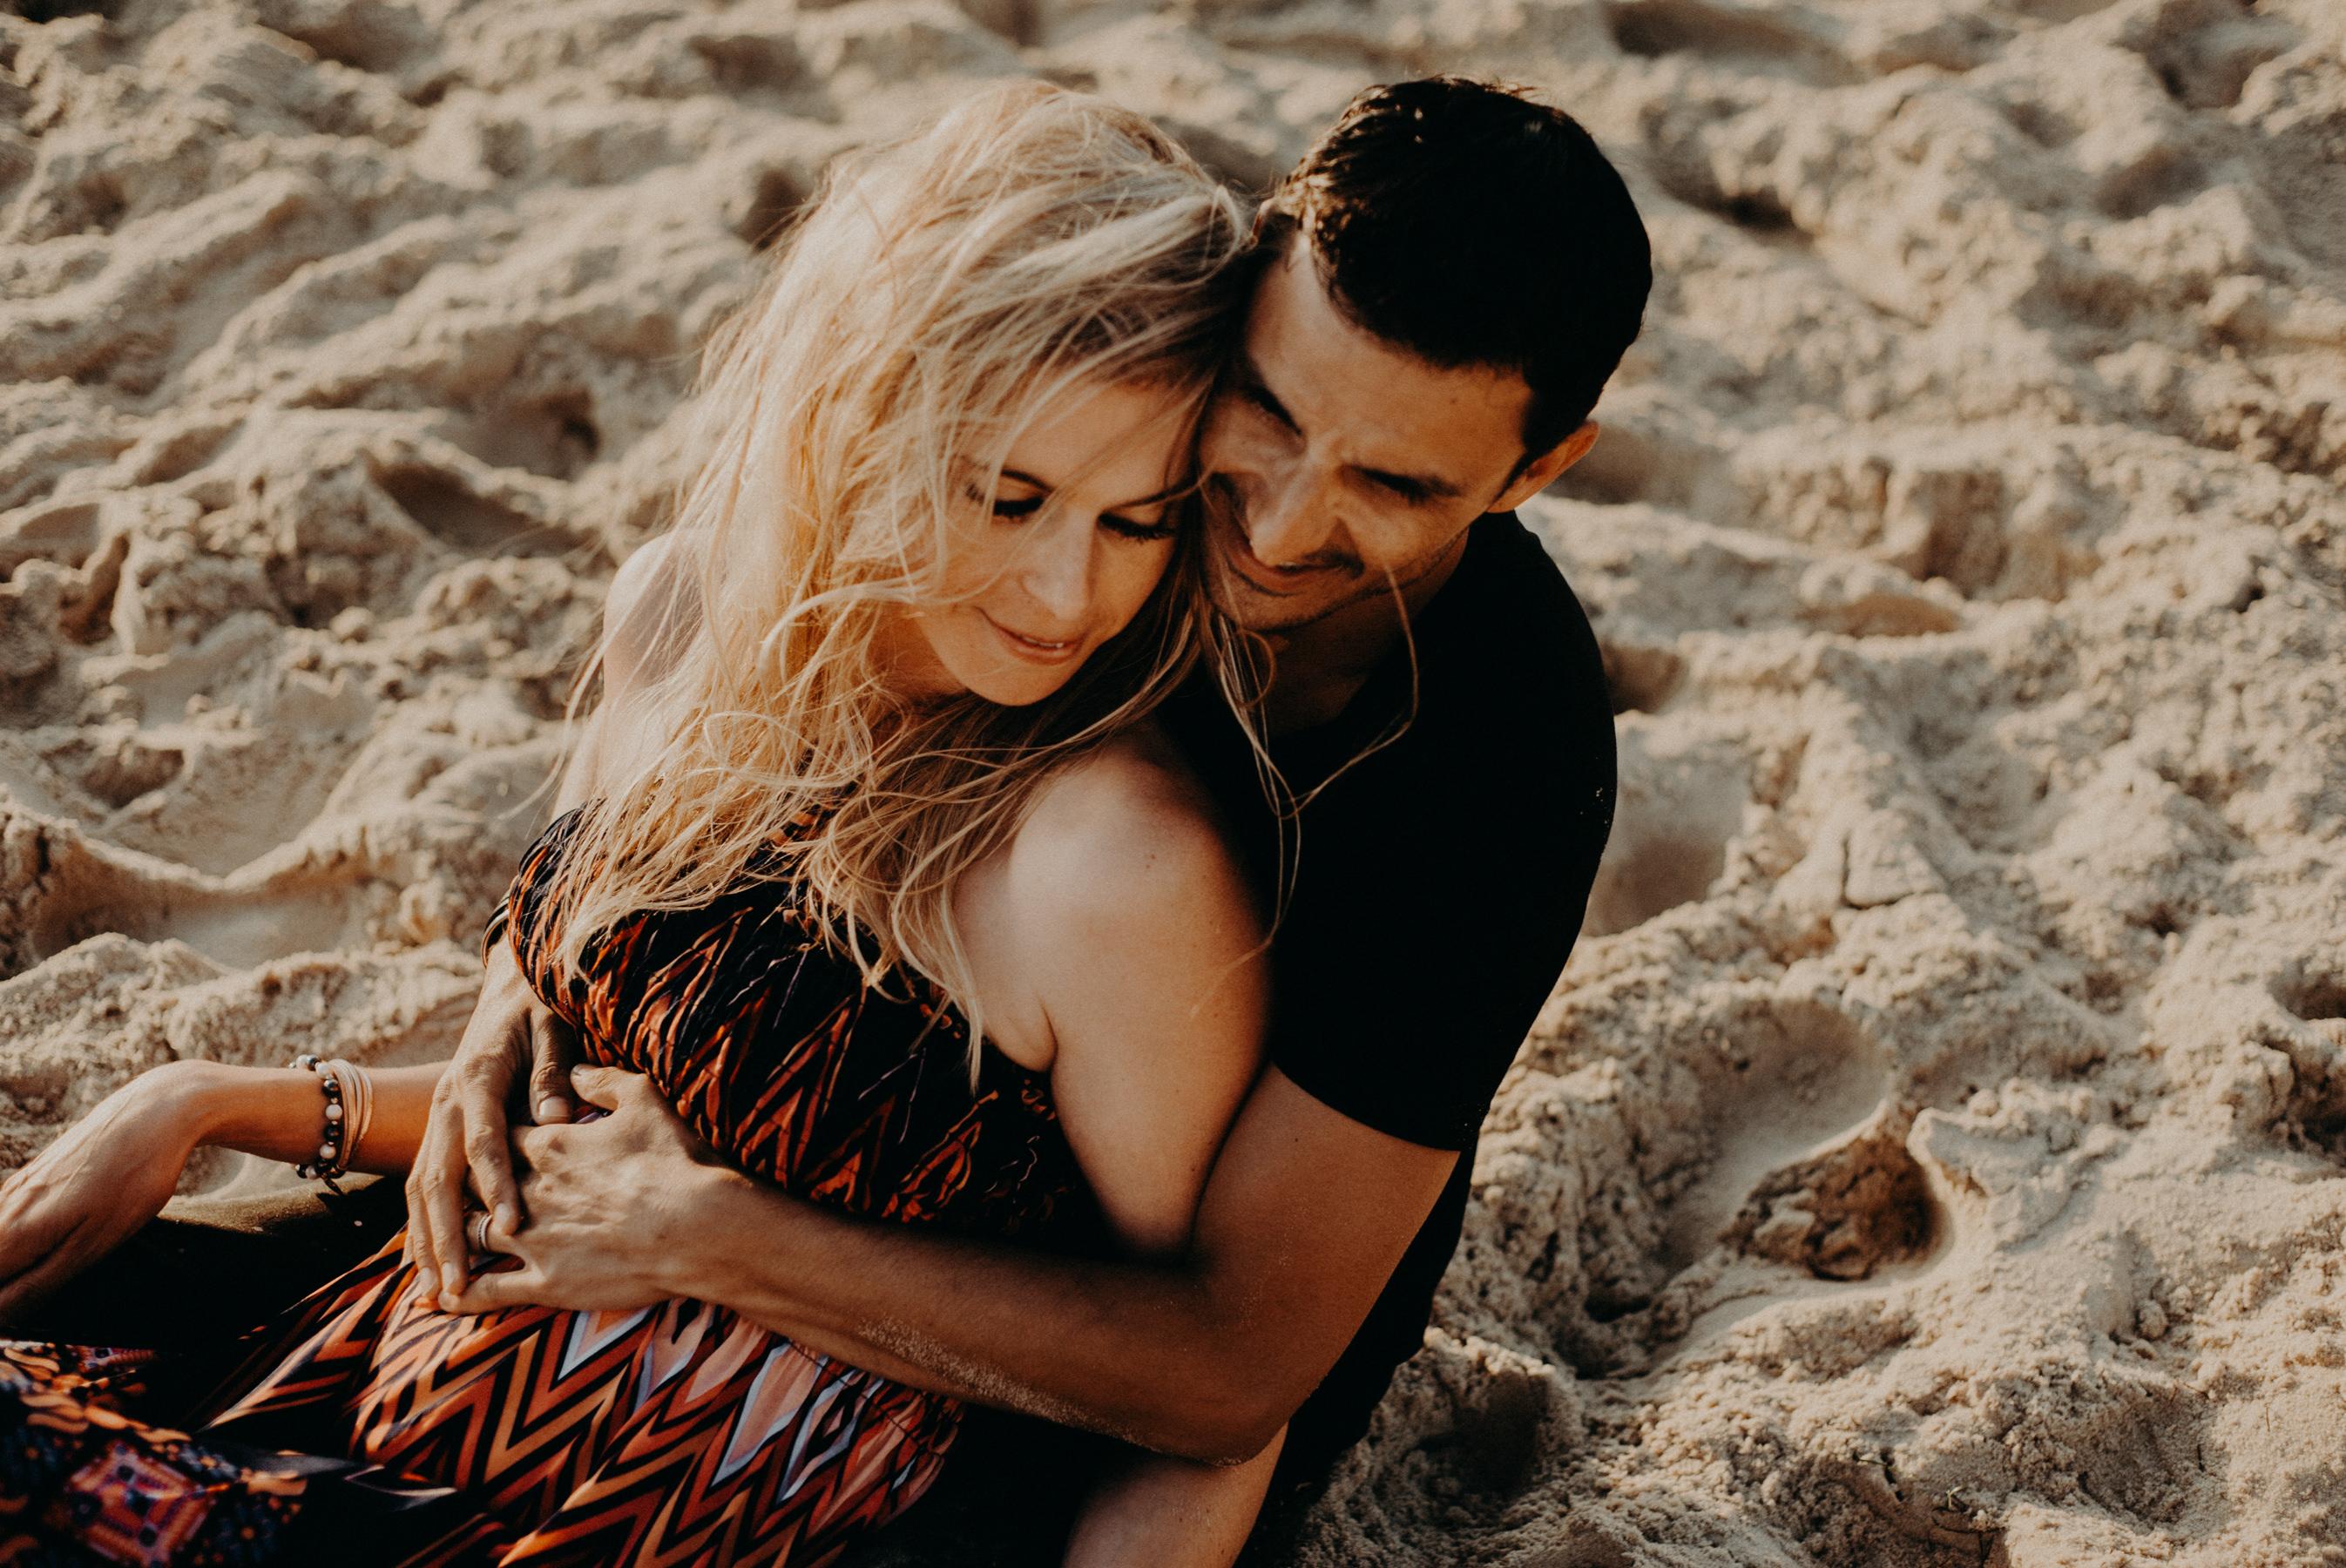 Photographe seance couple pyla corniche arcachon